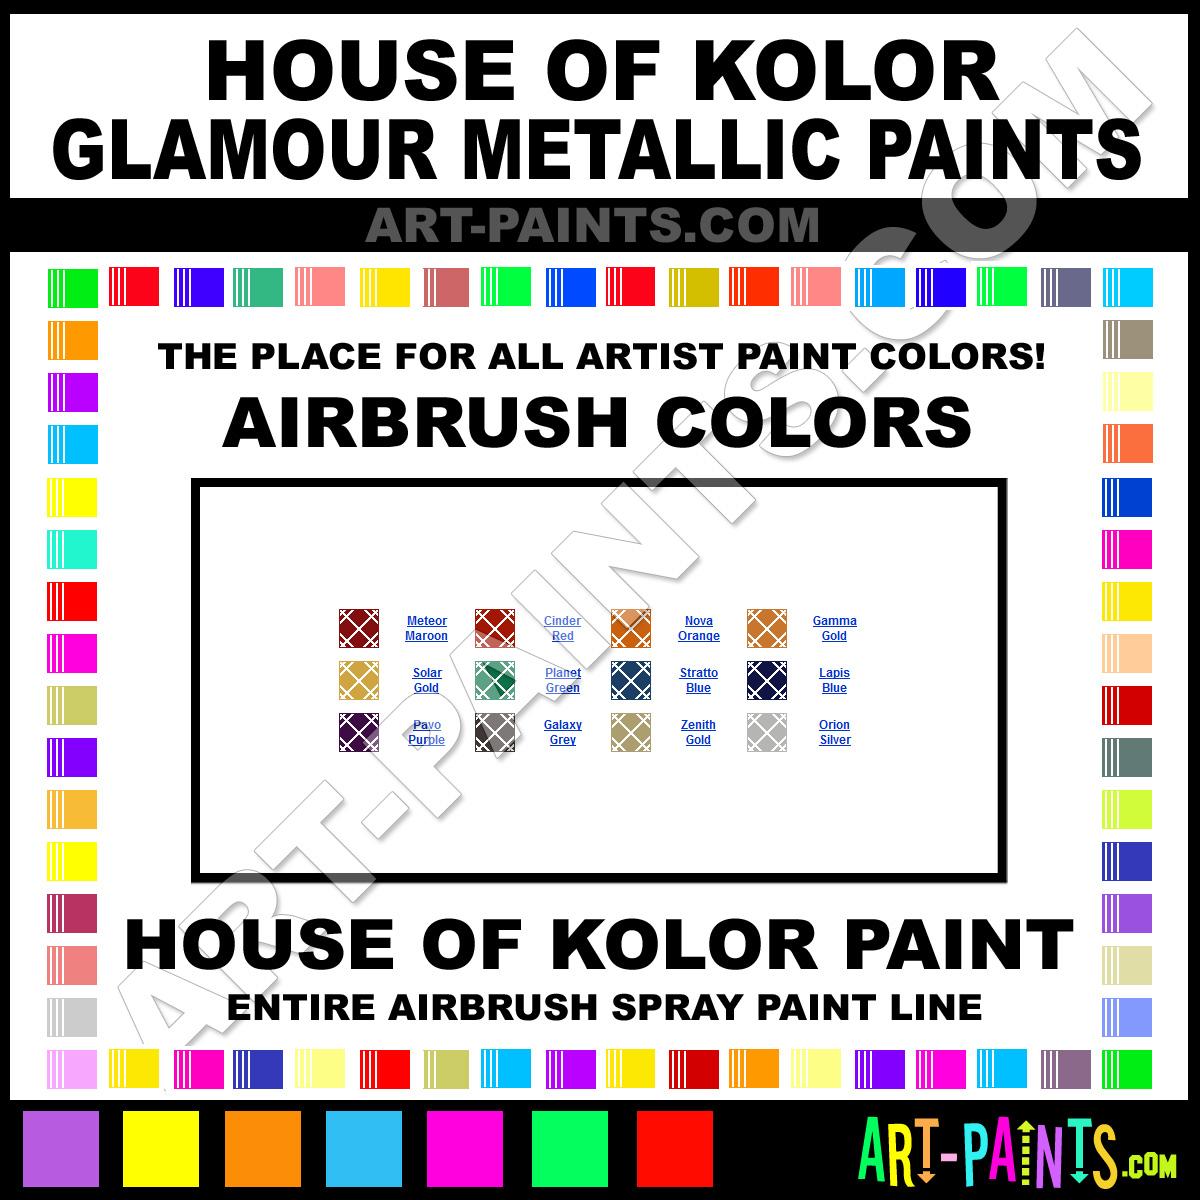 House Of Kolor Glamour Metallics Airbrush Spray Paint